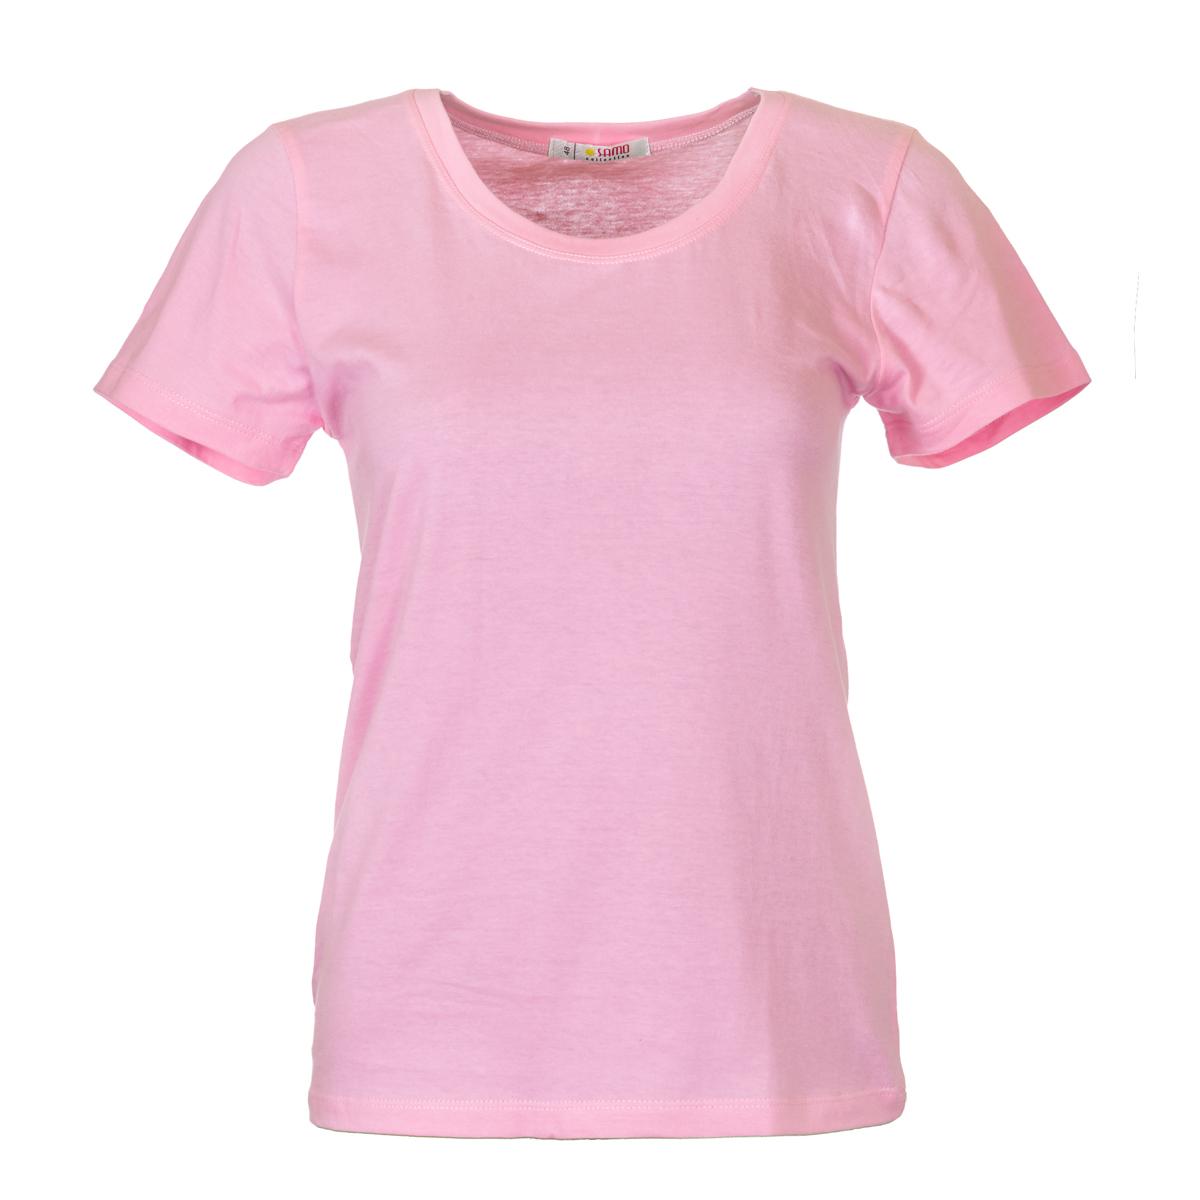 Жен. футболка арт. 04-0045 Розовый р. 50Майки и футболки<br>Фактический ОГ:84 см<br>Фактический ОТ:82 см<br>Фактический ОБ:94 см<br>Длина по спинке:59 см<br>Рост:164-170 см<br><br>Тип: Жен. футболка<br>Размер: 50<br>Материал: Супрем